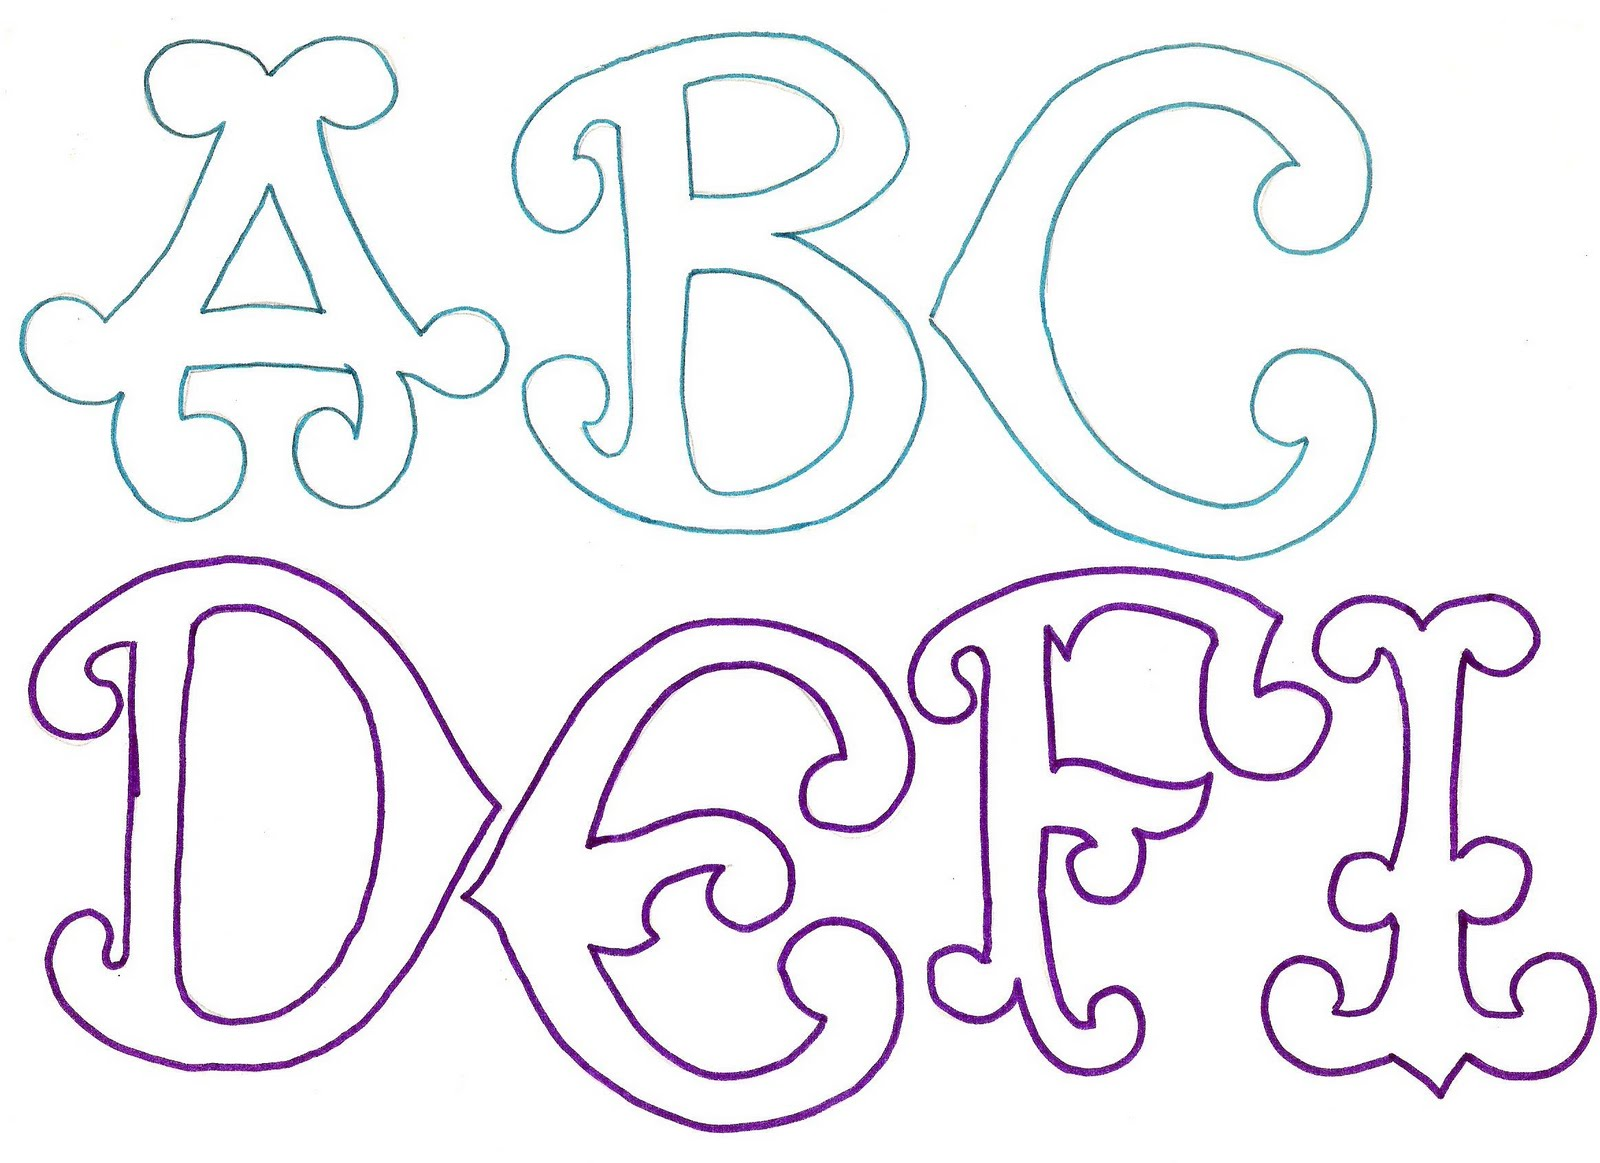 Maestroscomot letras curvas for Moldes para pavimentos de hormigon